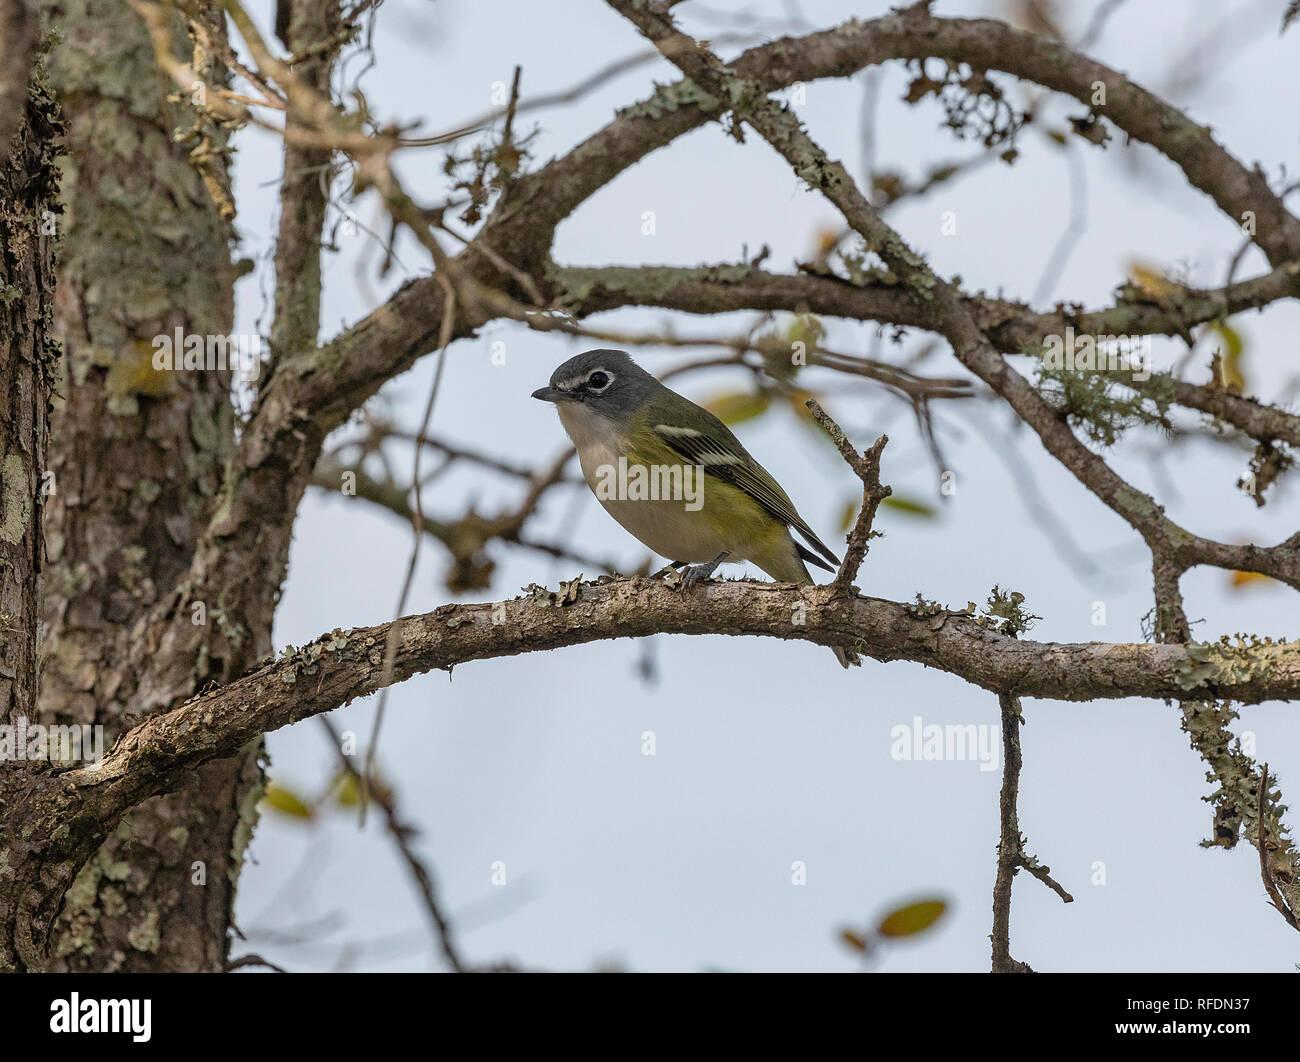 Blue-headed vireo, Vireo solitarius, feeding among tree branches in winter. Texas. Stock Photo